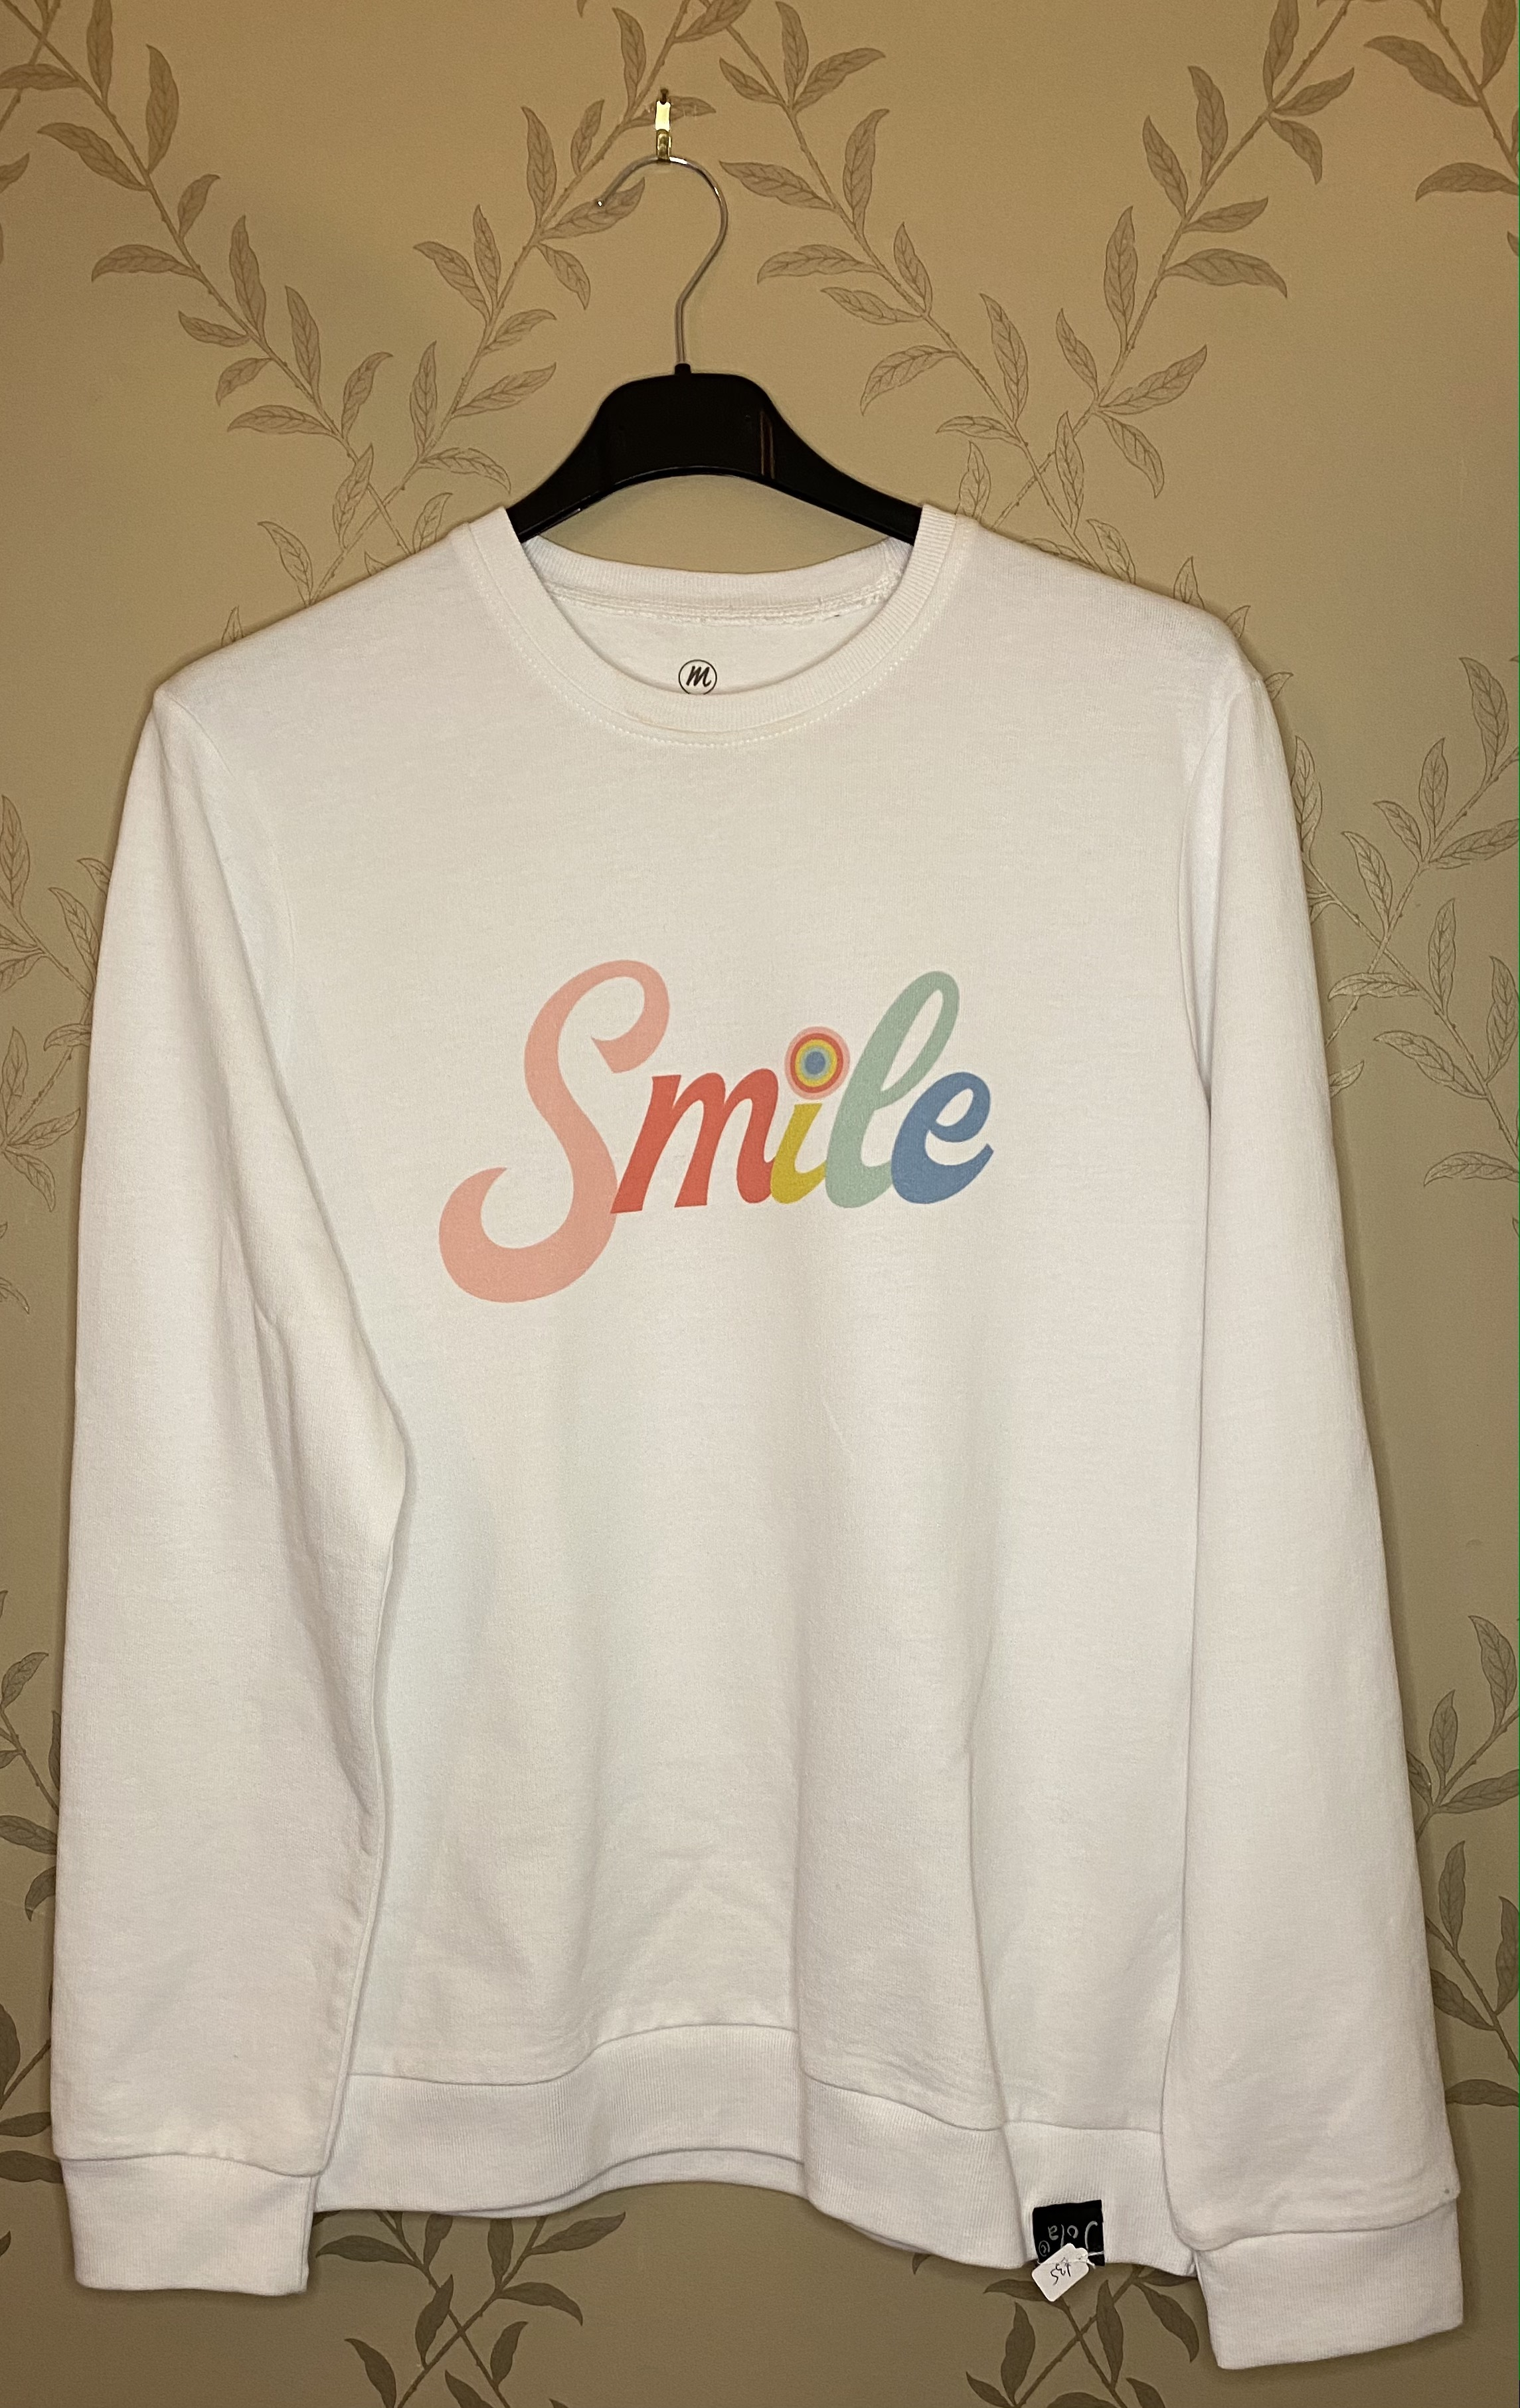 Jola oversized sweatshirt - Available in 3 designs